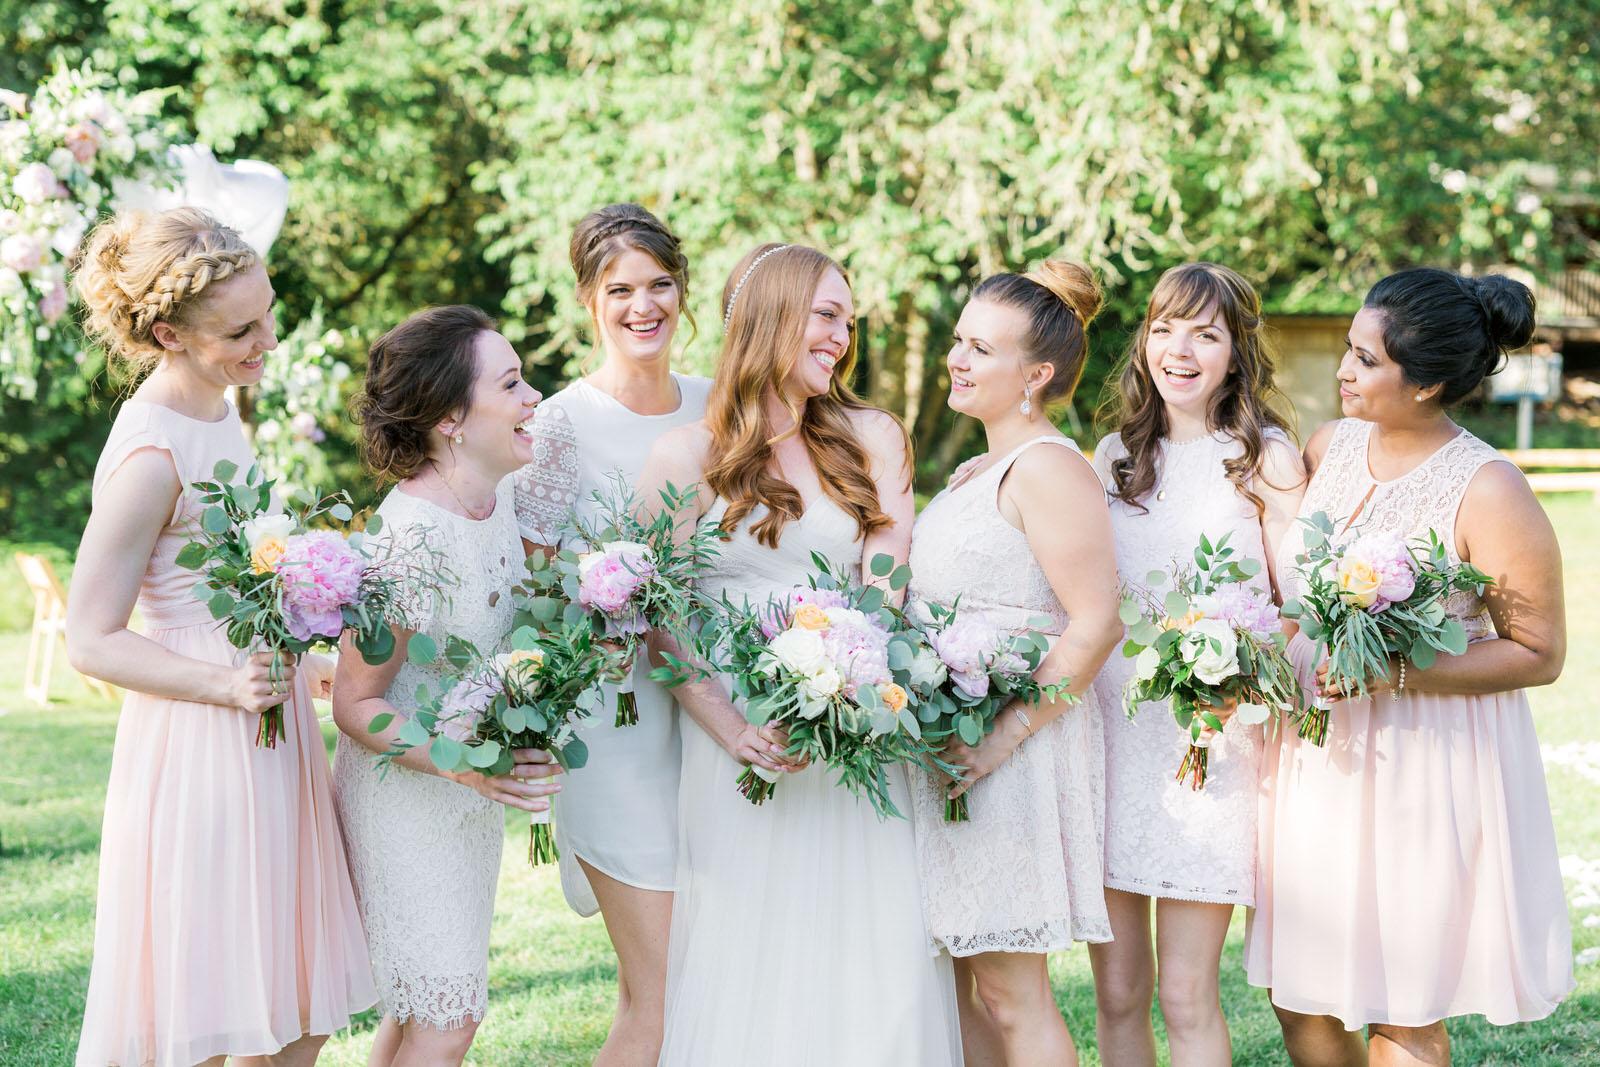 SUNSHINE COAST AND VANCOUVER WEDDING PHOTOGRAPHER